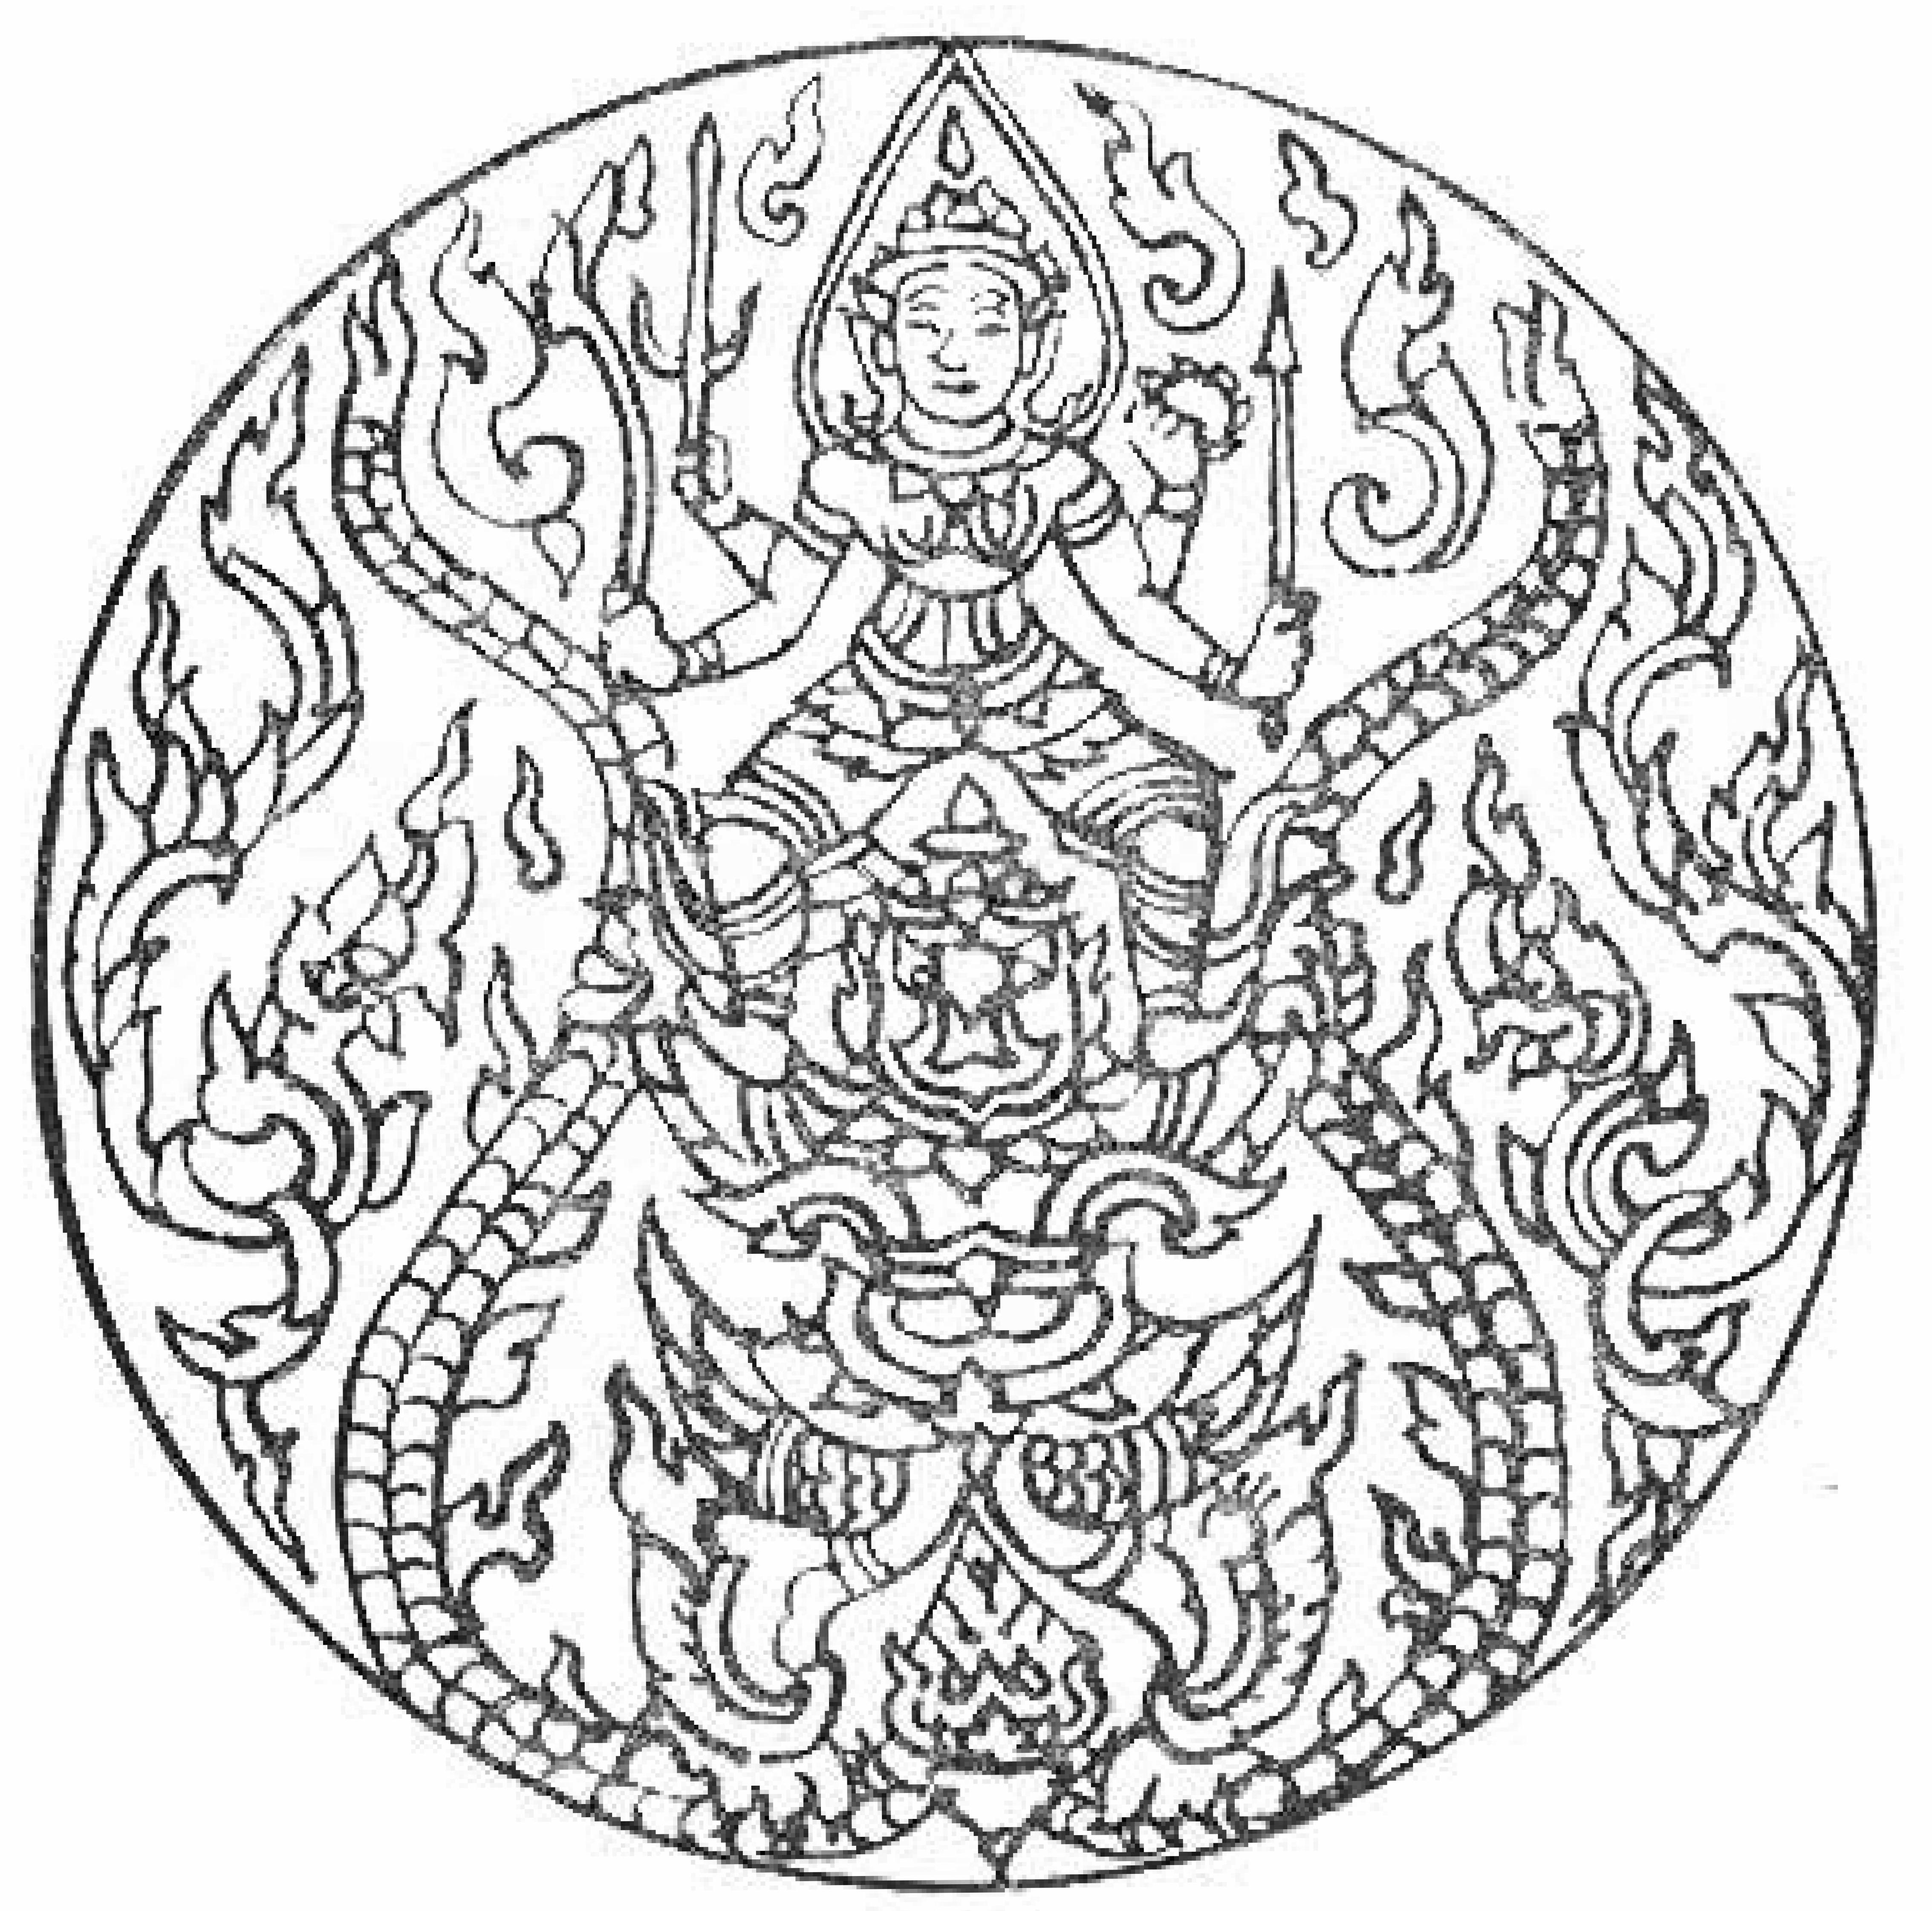 free coloring mandalas free printable mandala coloring pages for adults best coloring free mandalas